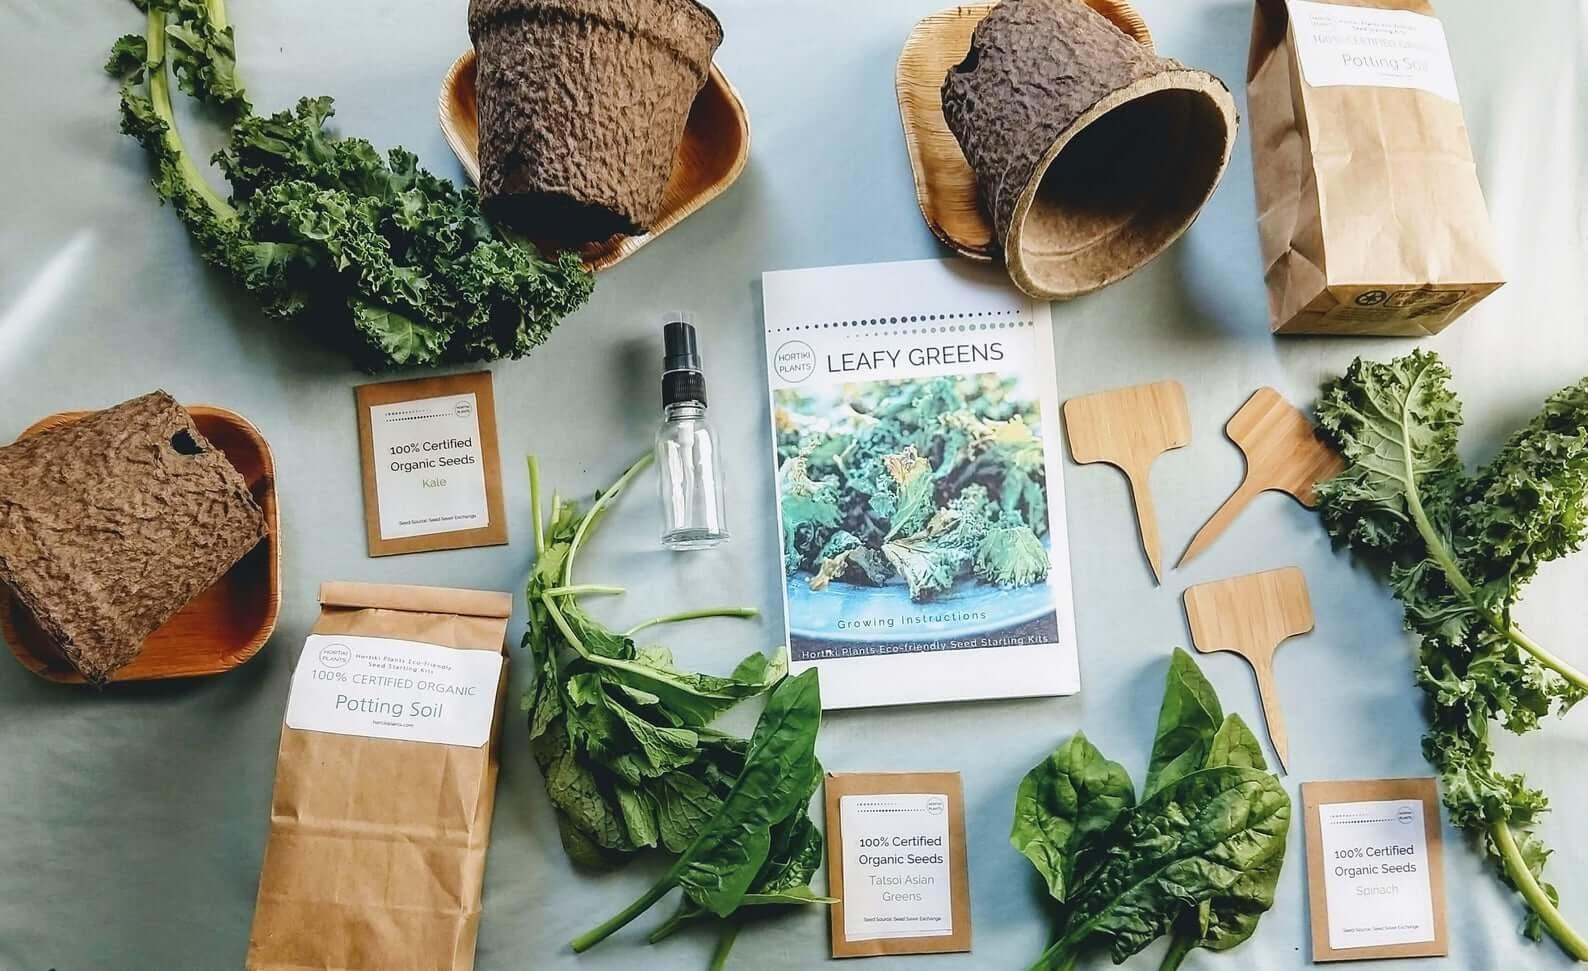 HortikiPlants garden kit